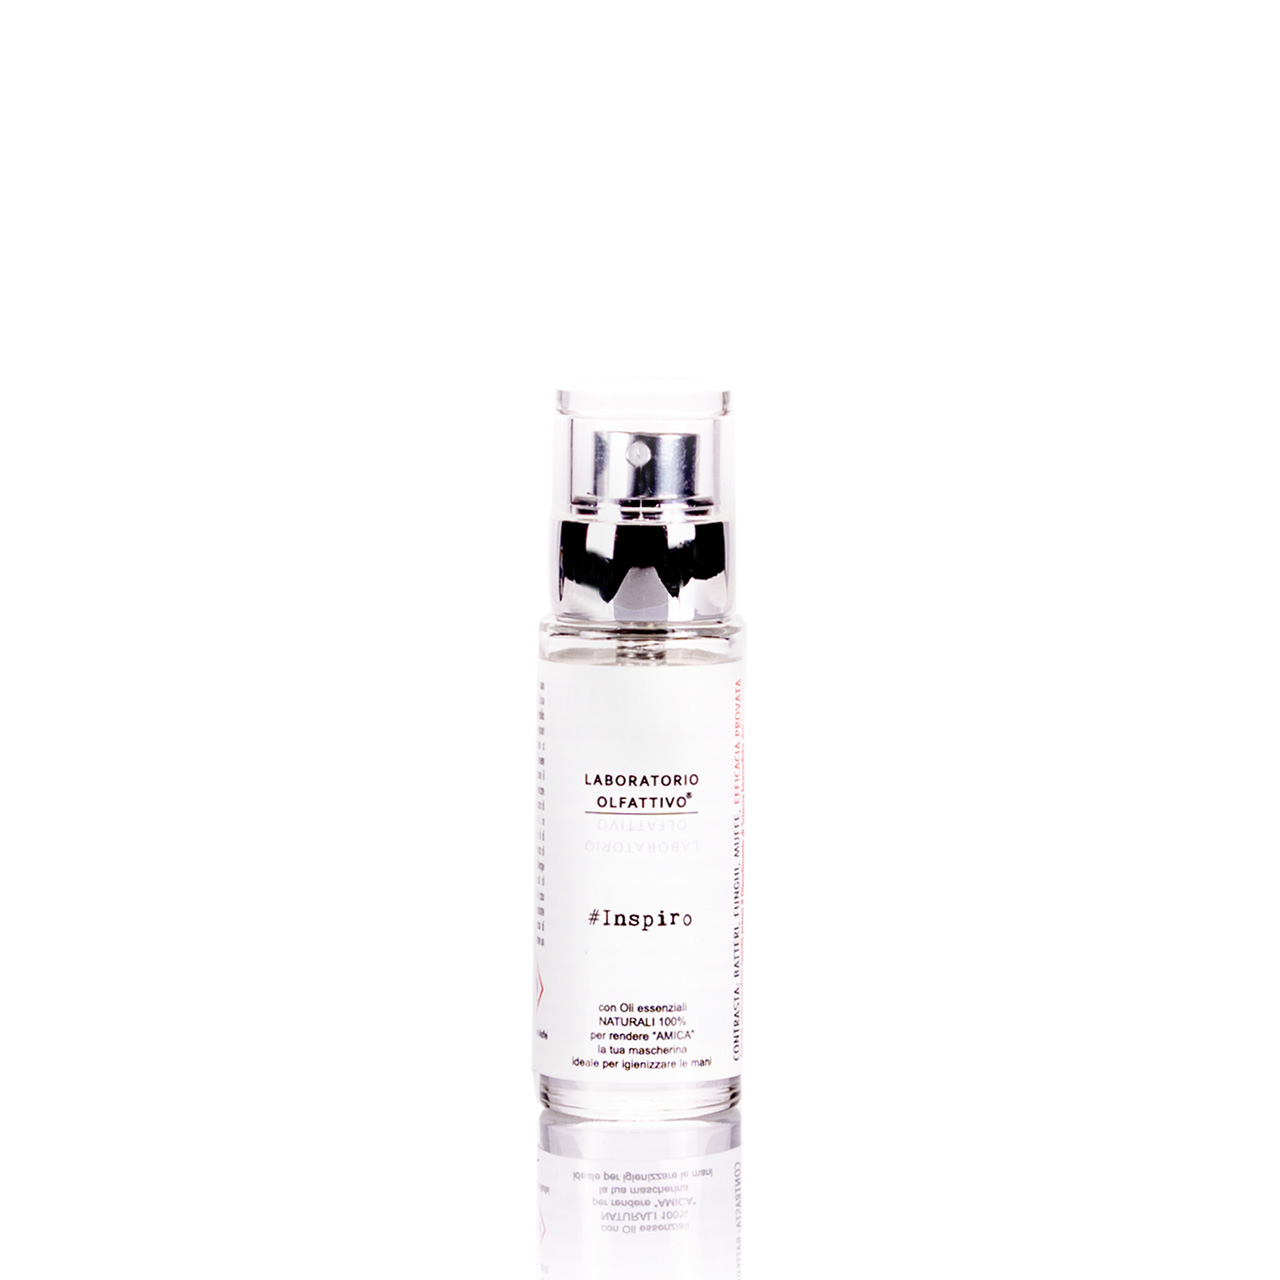 Inspiro - Spray Igienizzante Mani & Mascherina